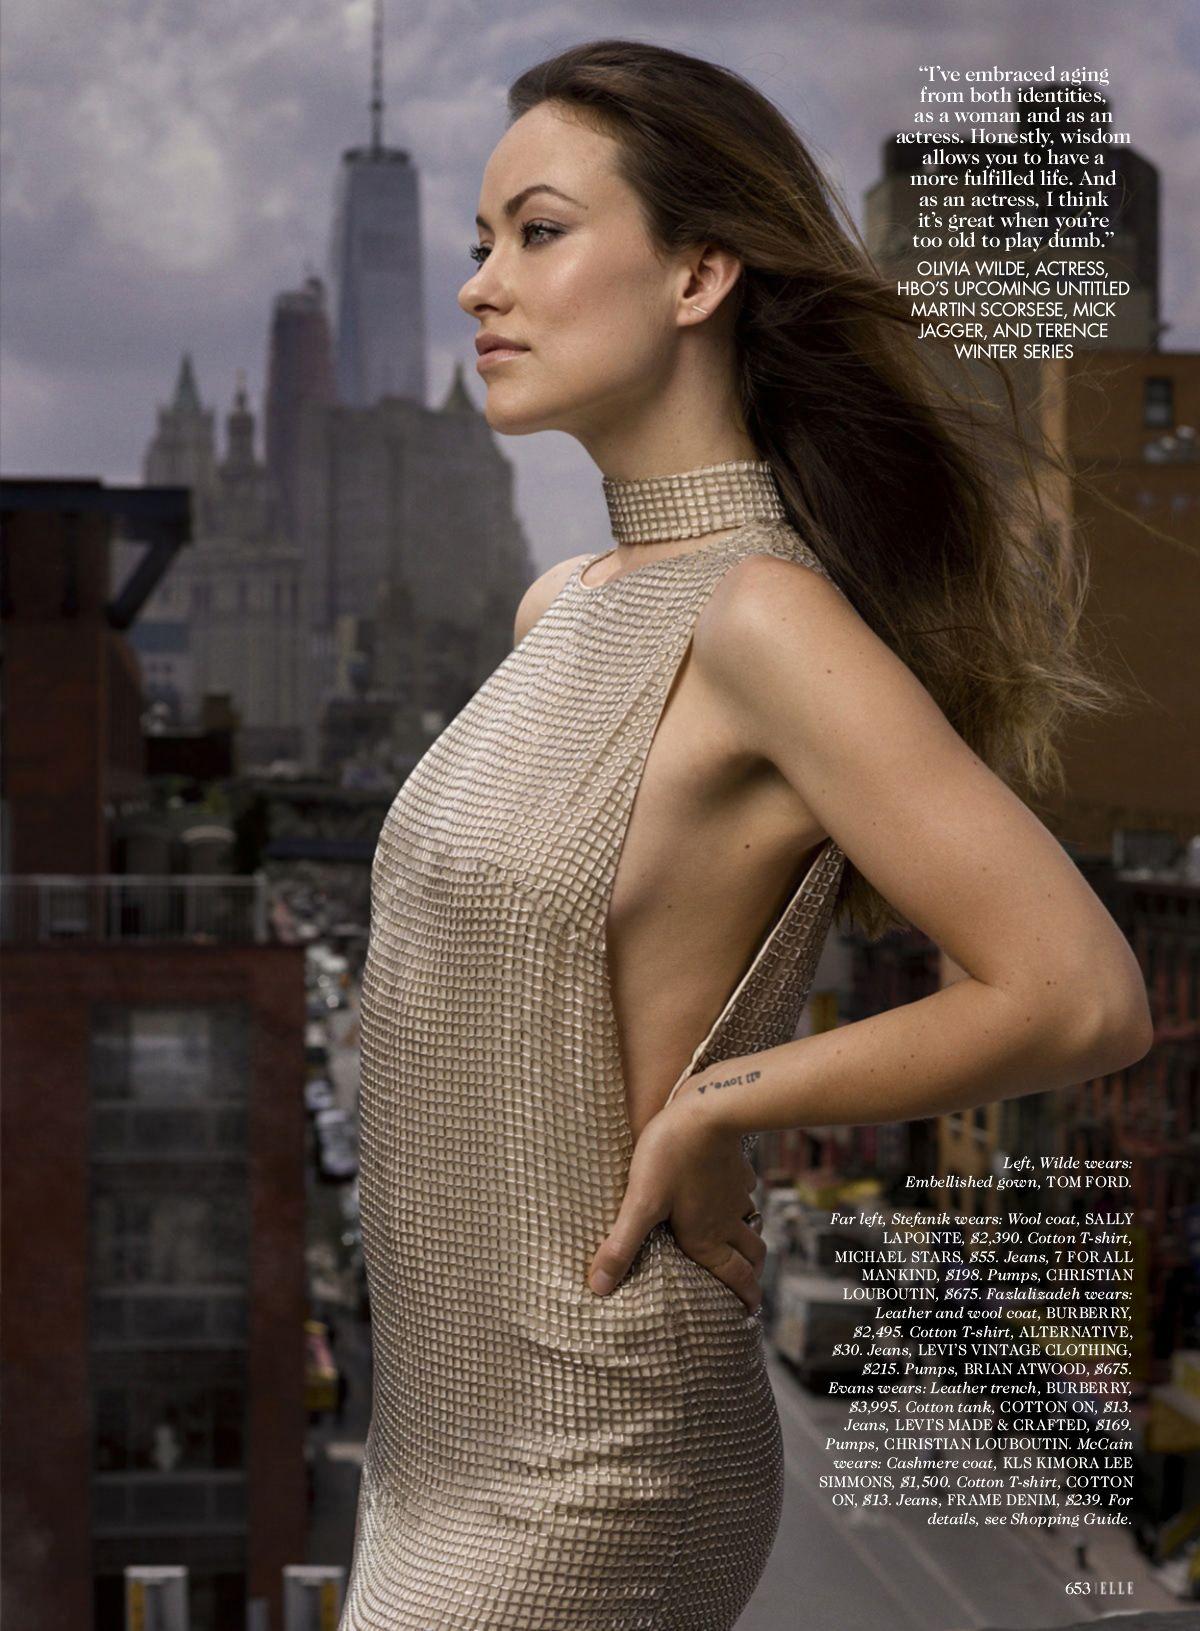 OLIVIA WILDE in Elle 30th Anniversary Portfolio, September 2015 Issue